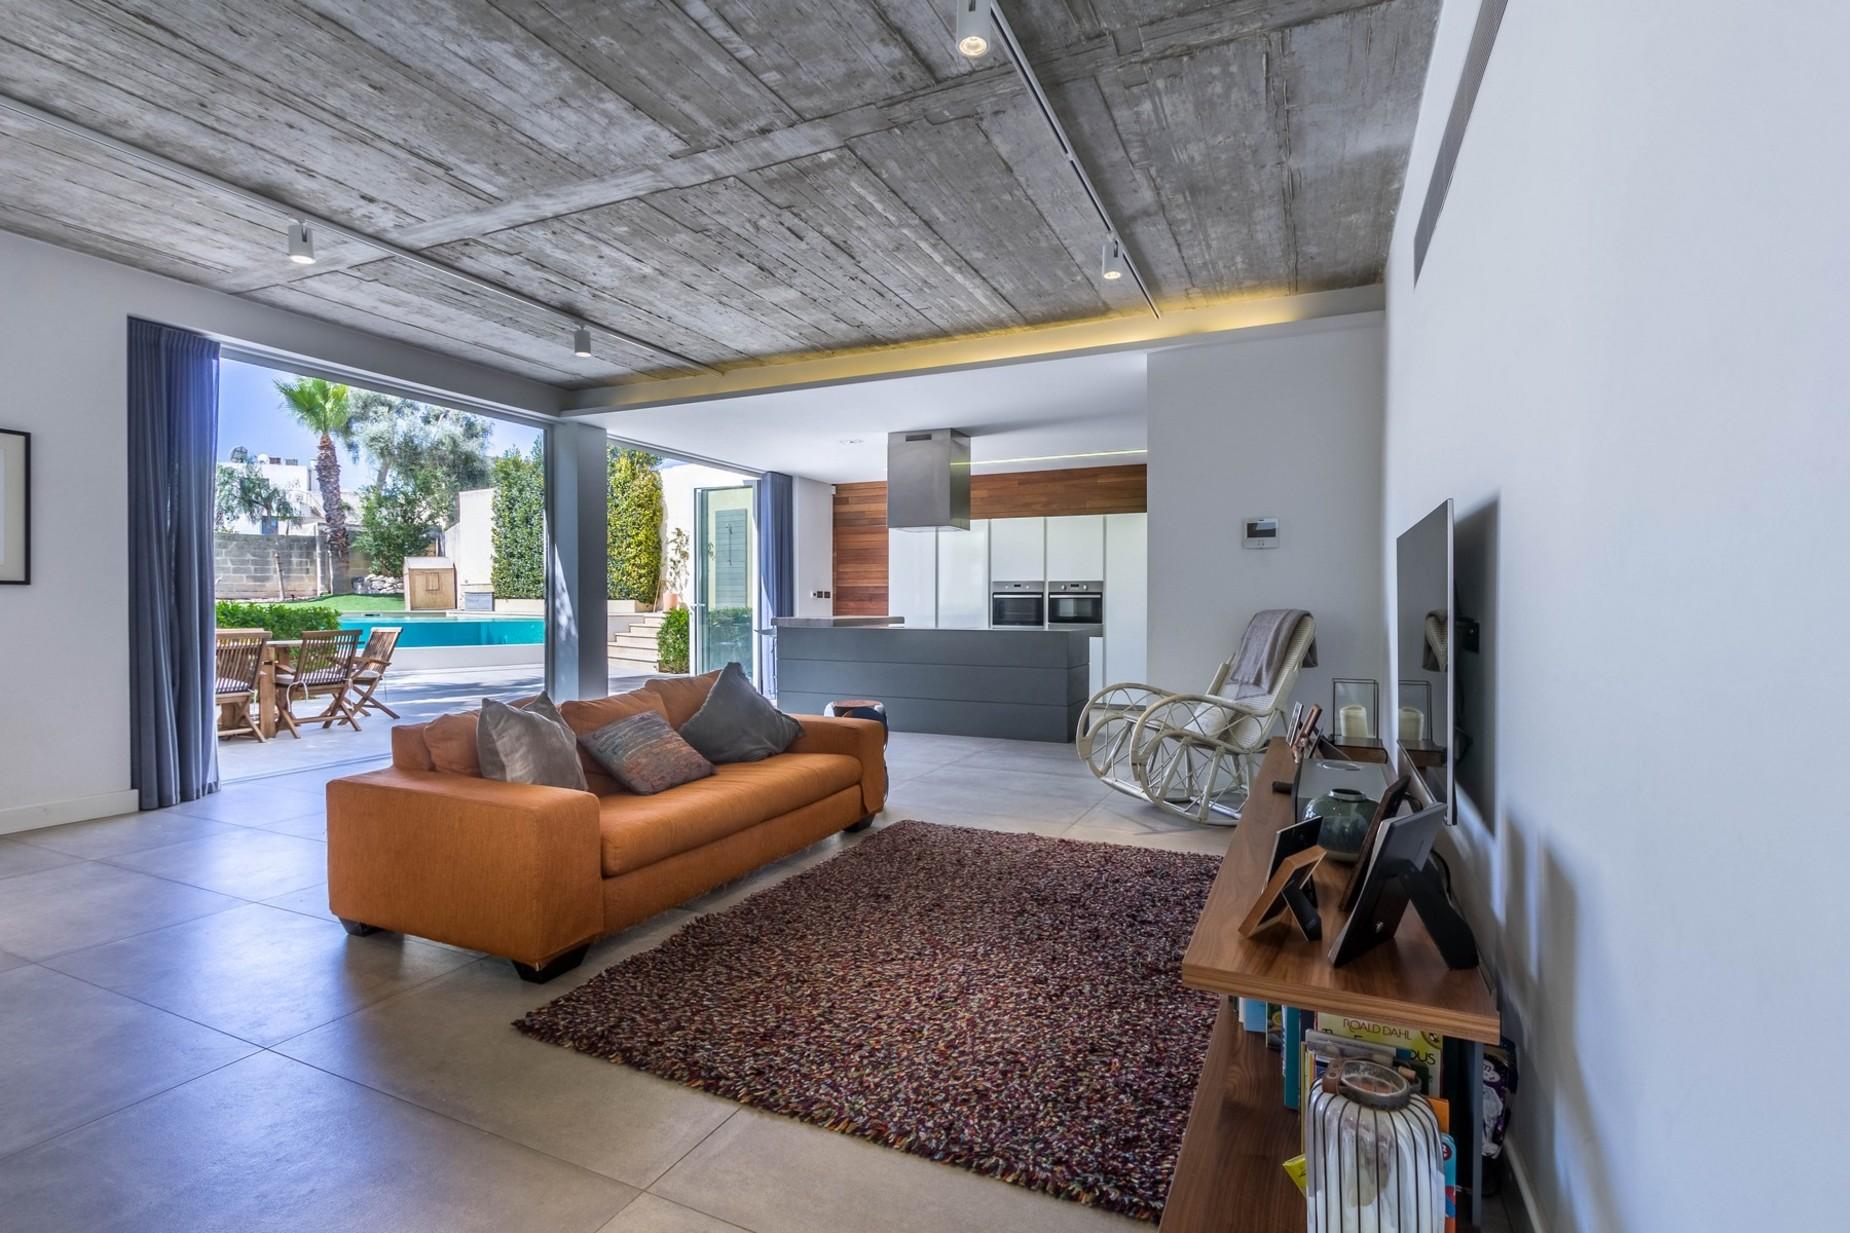 4 bed Villa For Sale in Gharghur, Gharghur - thumb 11